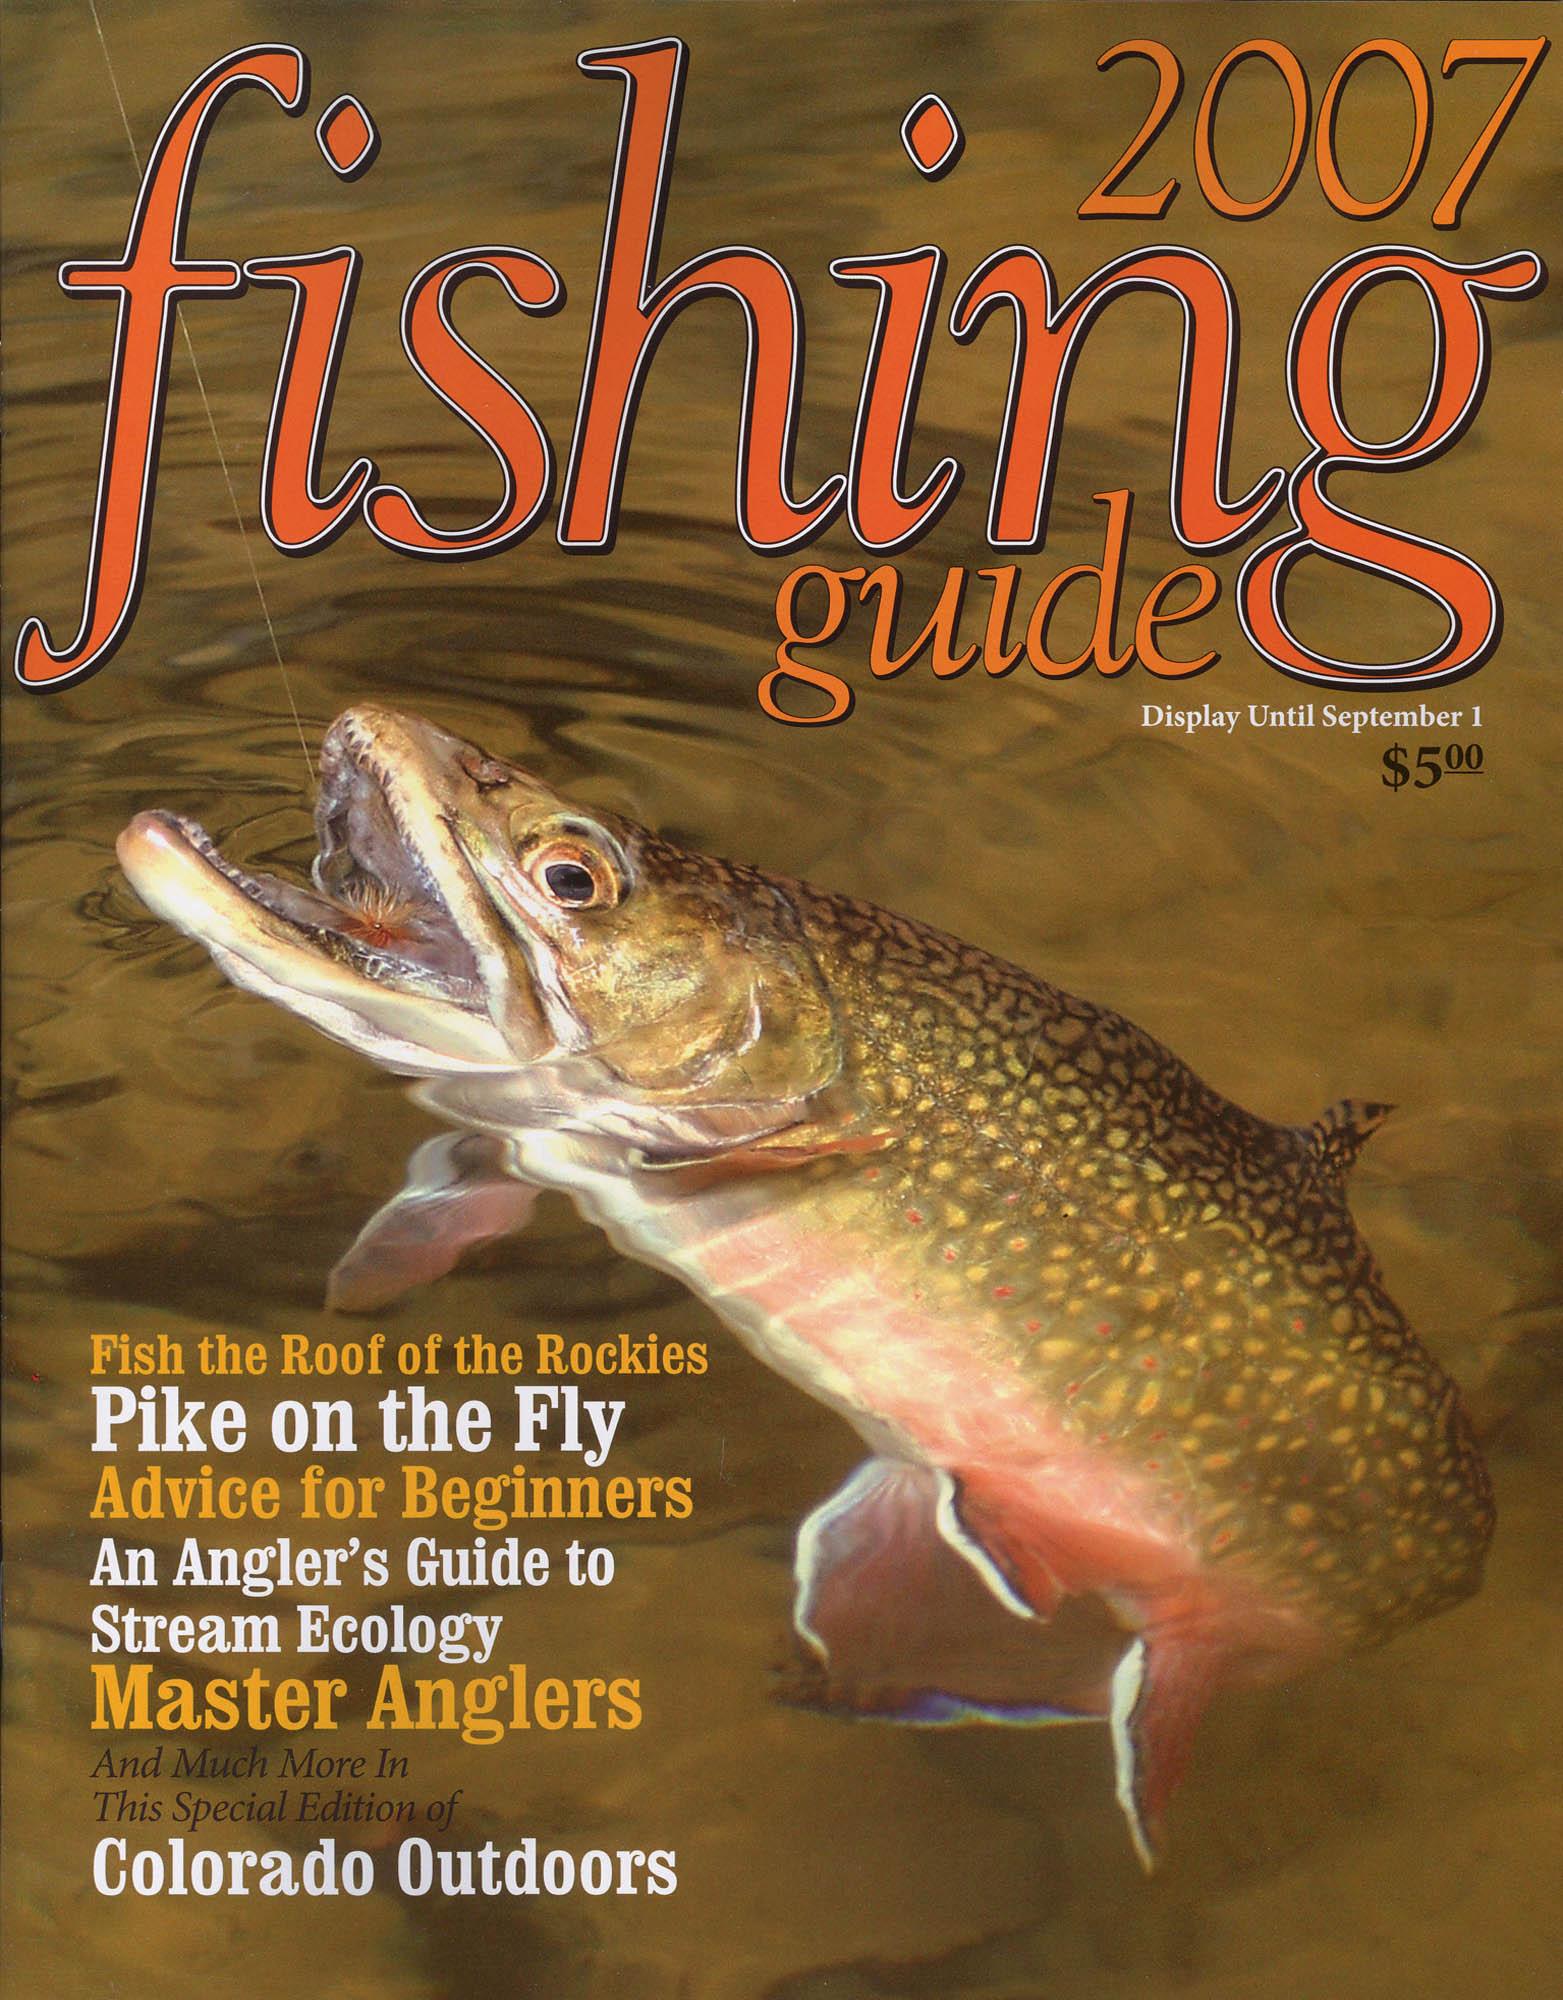 Colorado Outdoors Fishing Guide